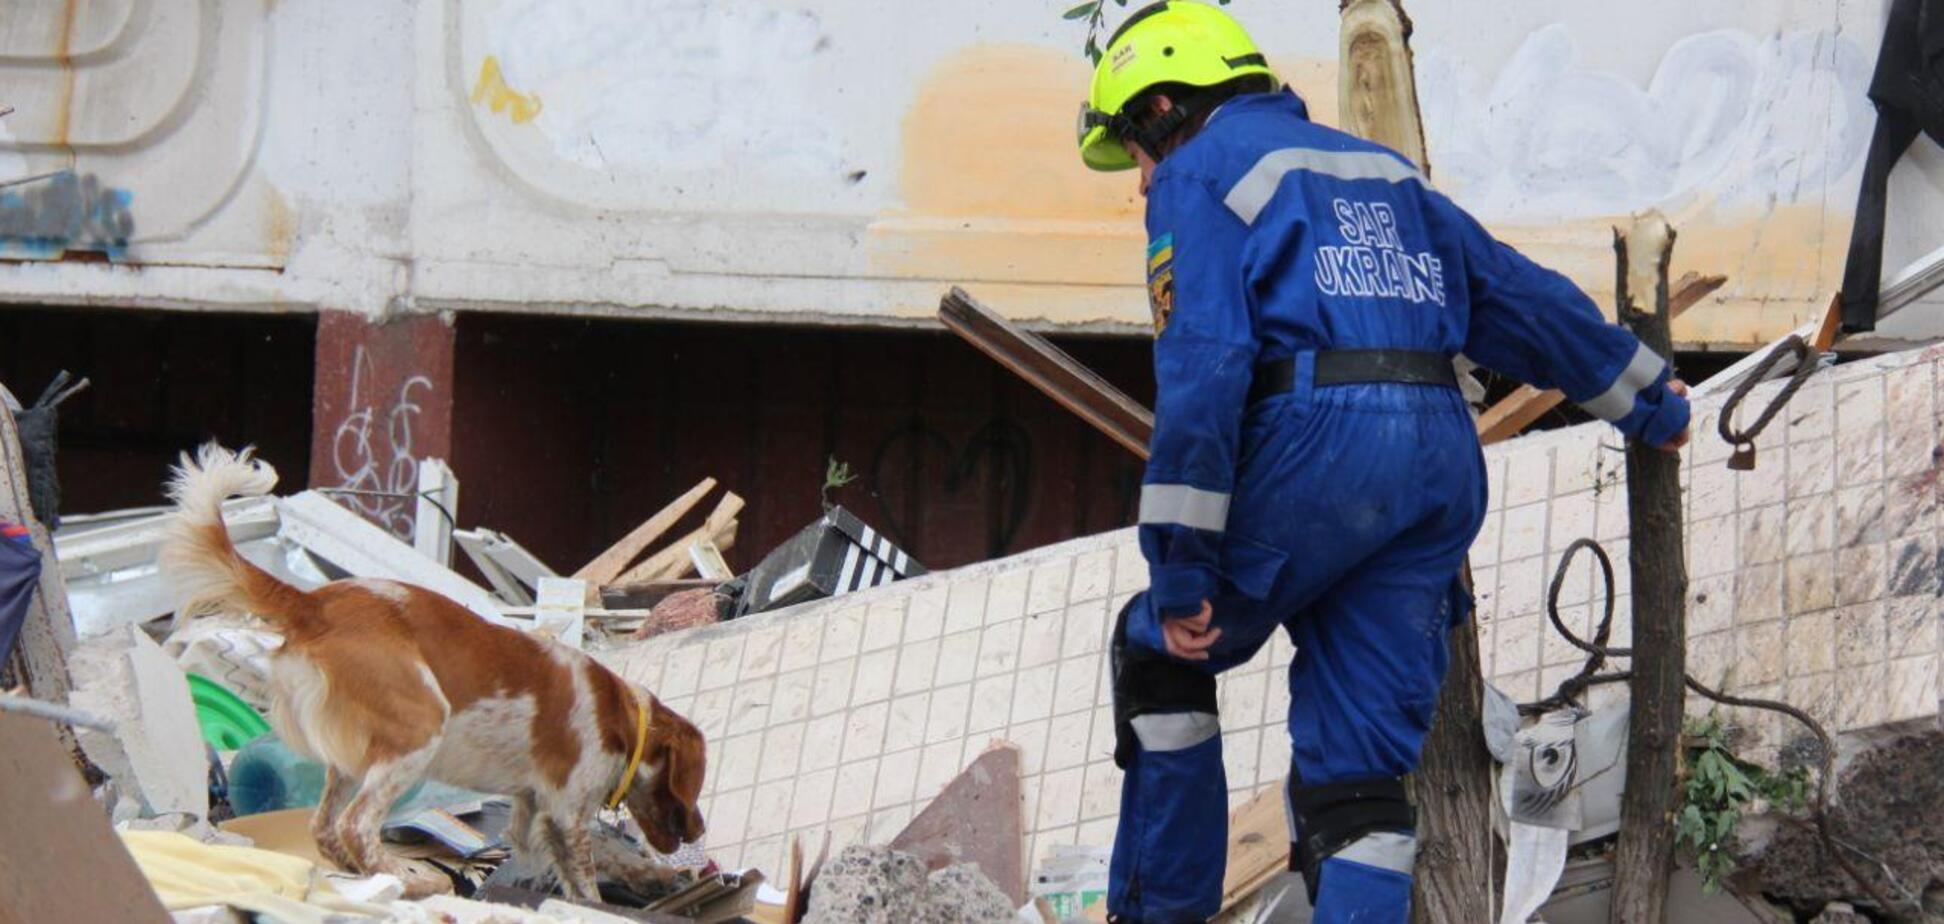 Взрыв дома на Позняках: обнаружена еще одна жертва